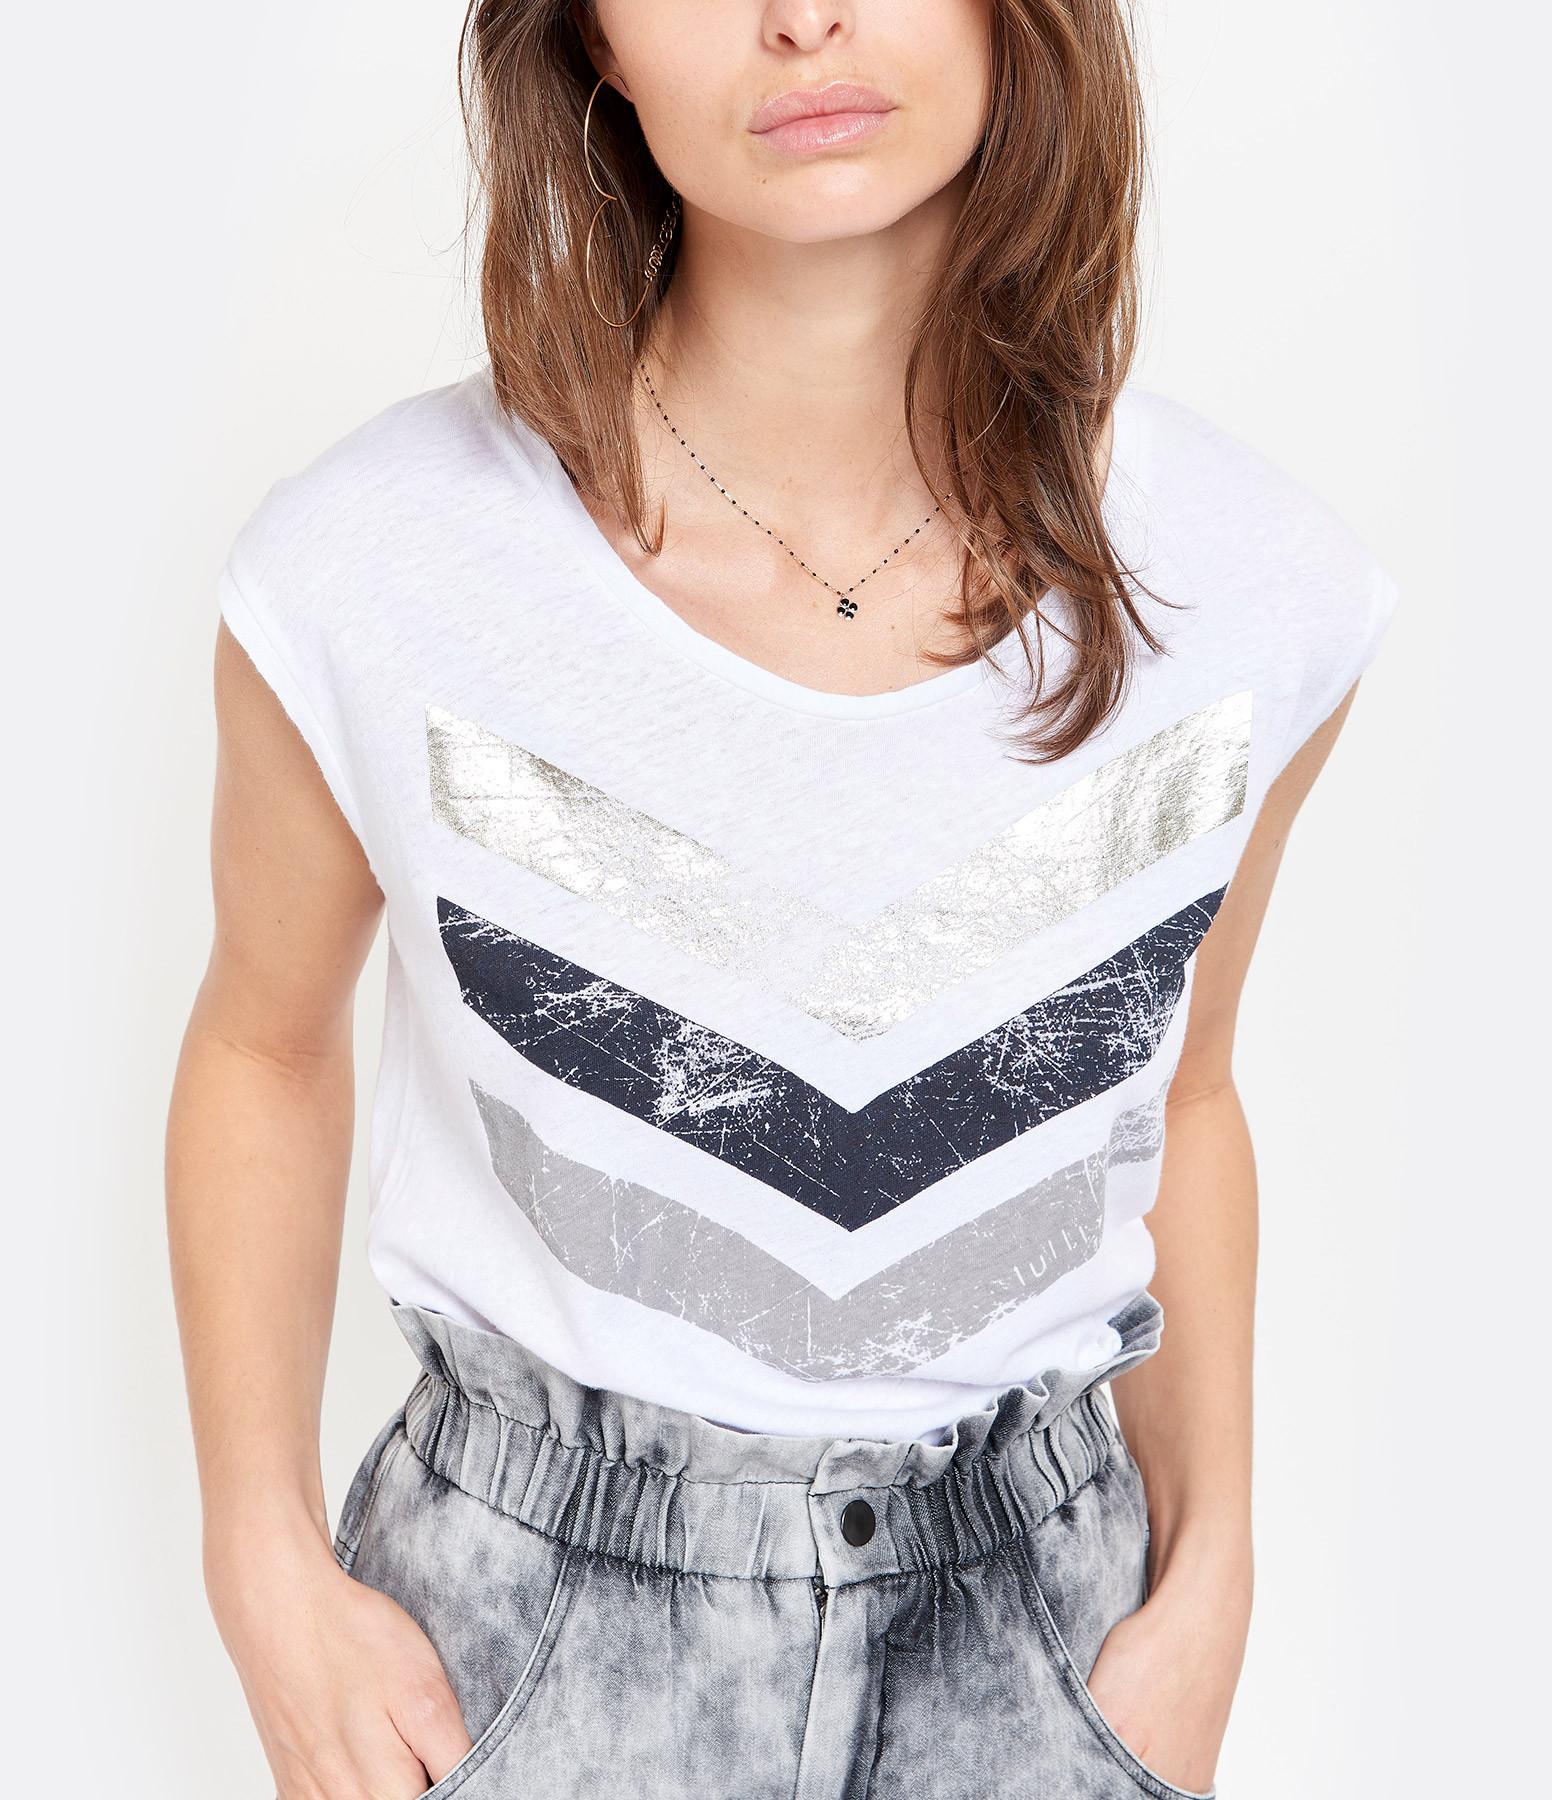 JUNE 7.2 - Tee-shirt Hayden Logo Blanc Doré Argenté, Exclu